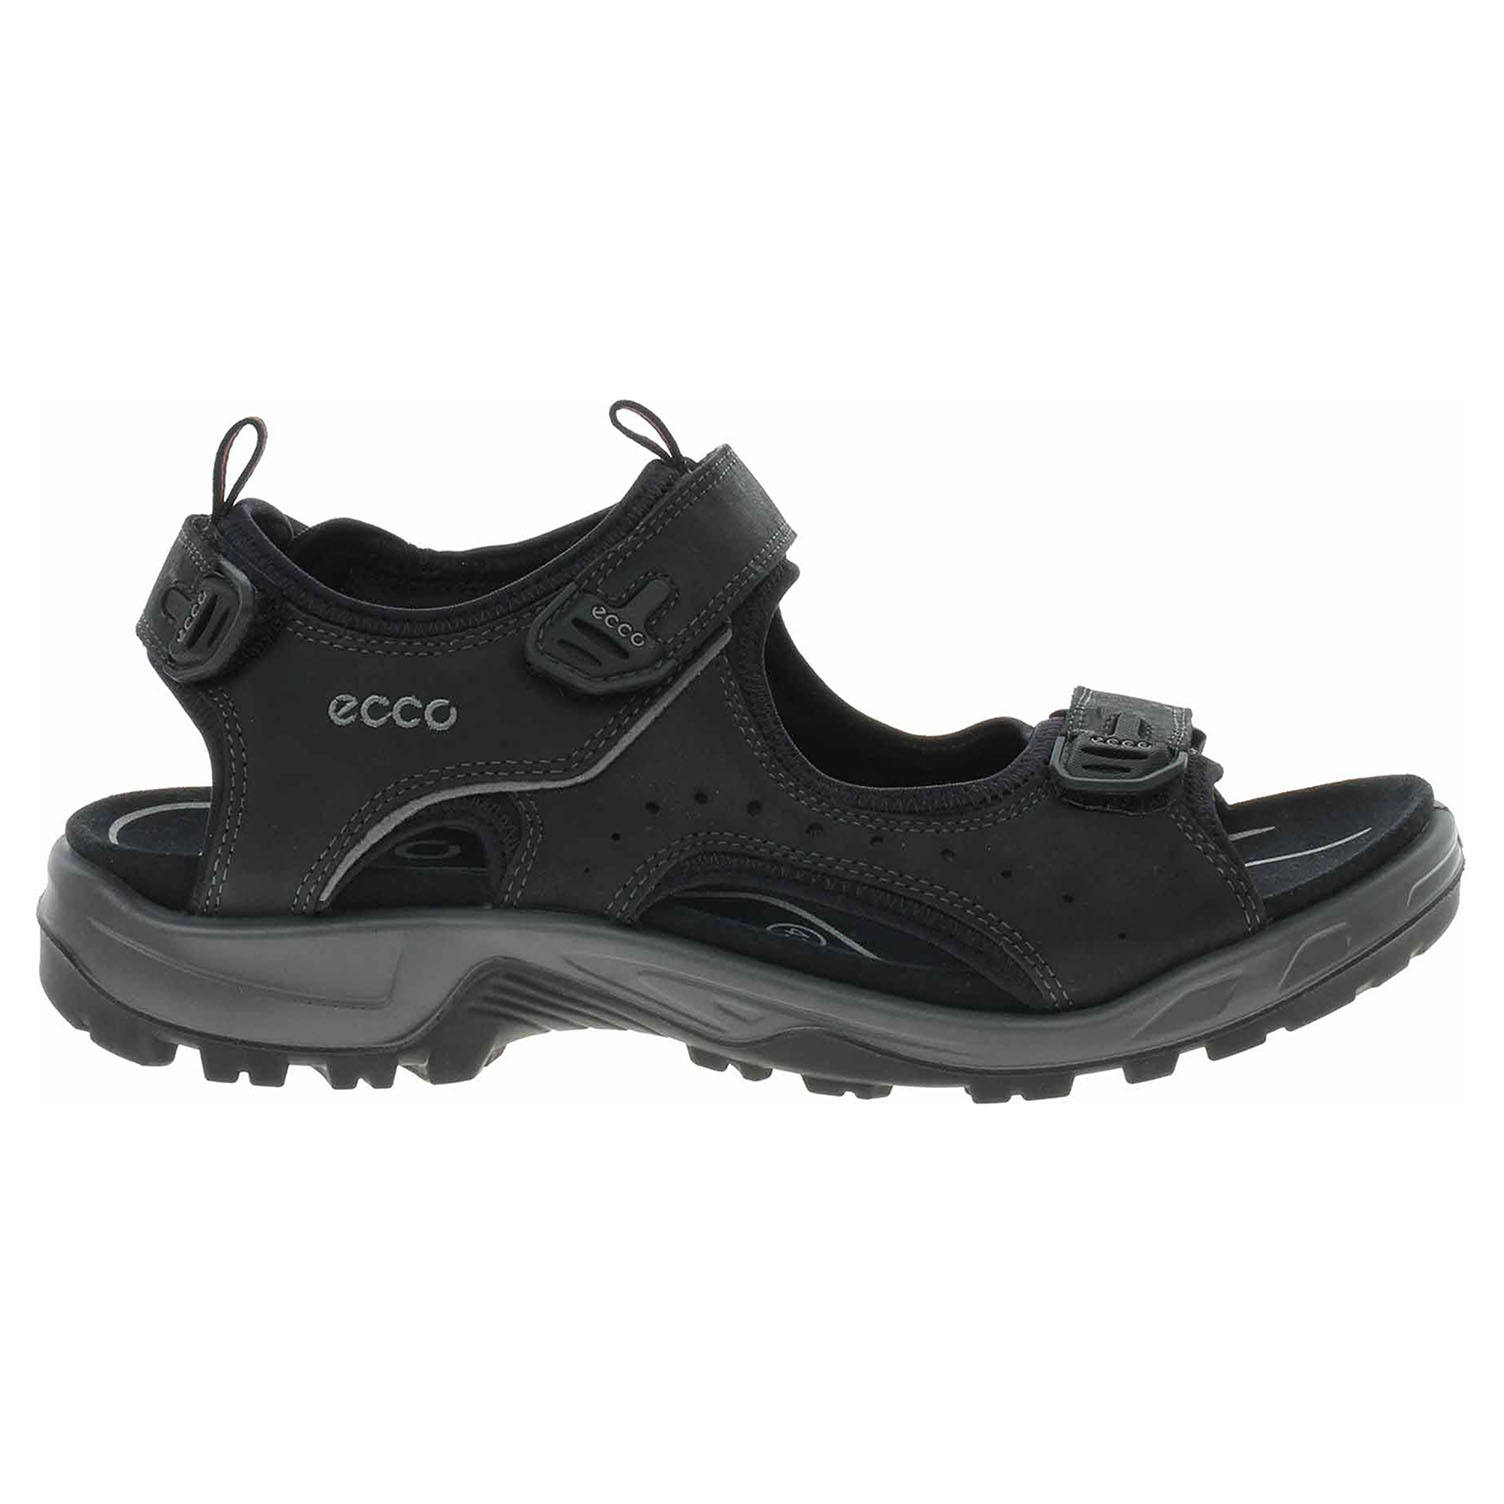 Ecco Ecco Offroad pánské sandály 82204412001 black 24700270 a283797661